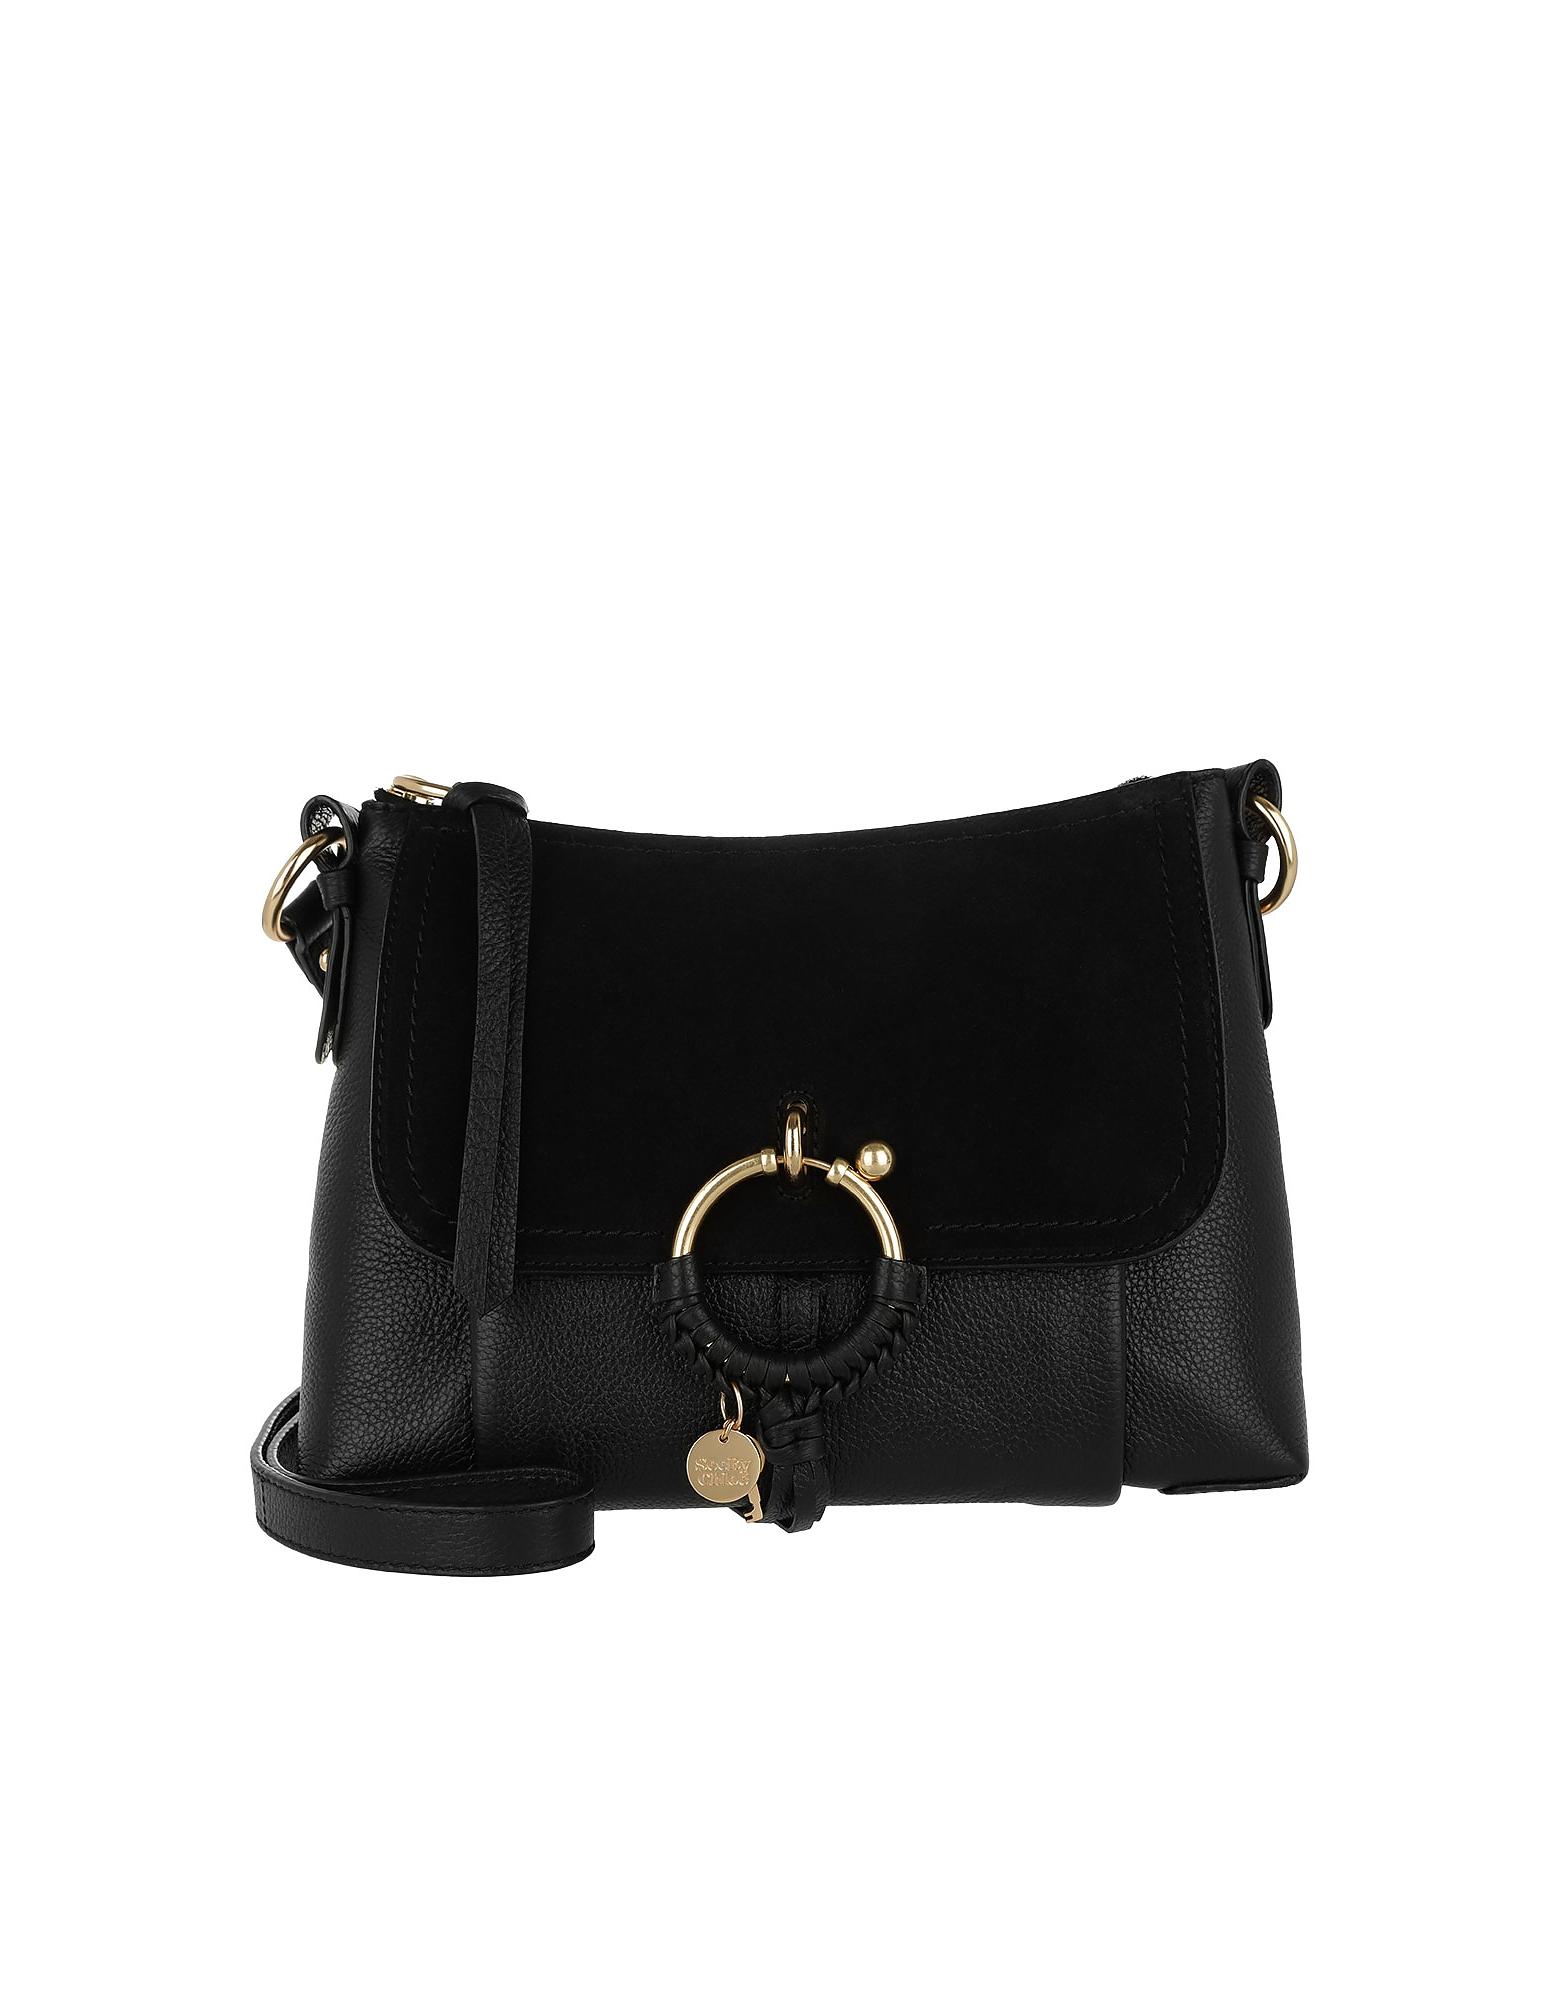 See by Chloé Designer Handbags, Black Joan Bag